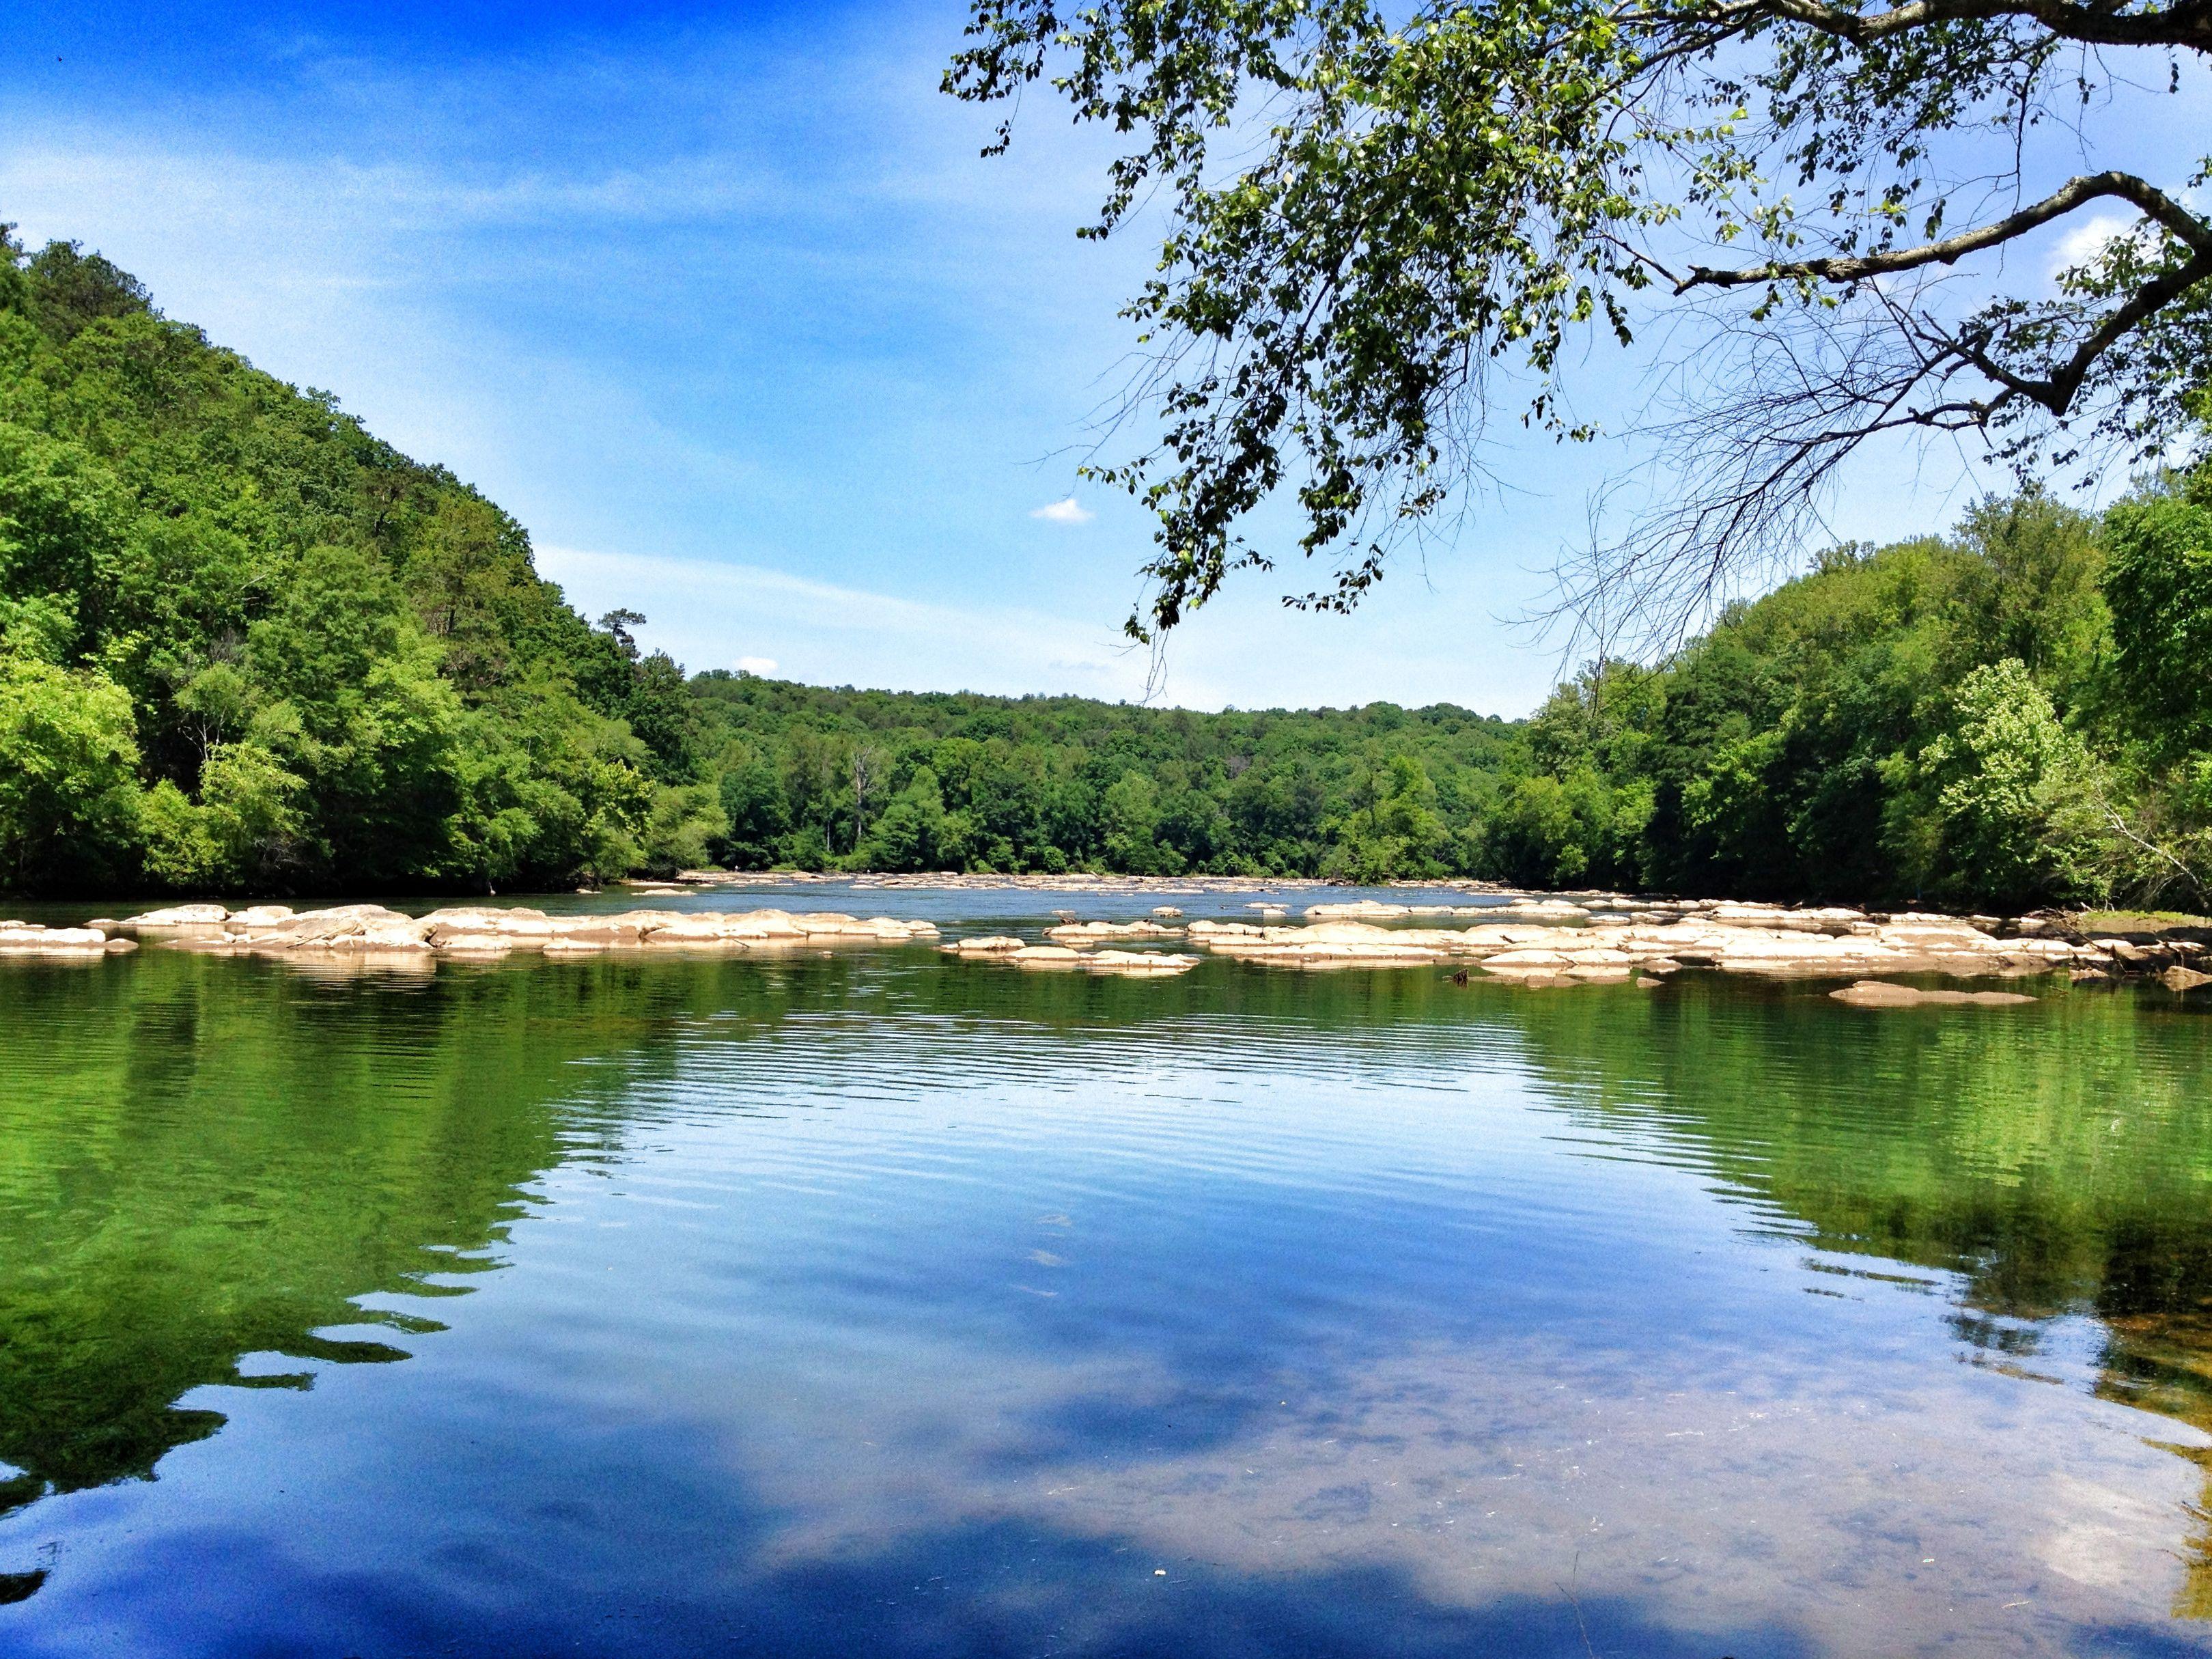 Chattahoochee River at East Palisades, Chattahoochee River National Recreation Area, Atlanta